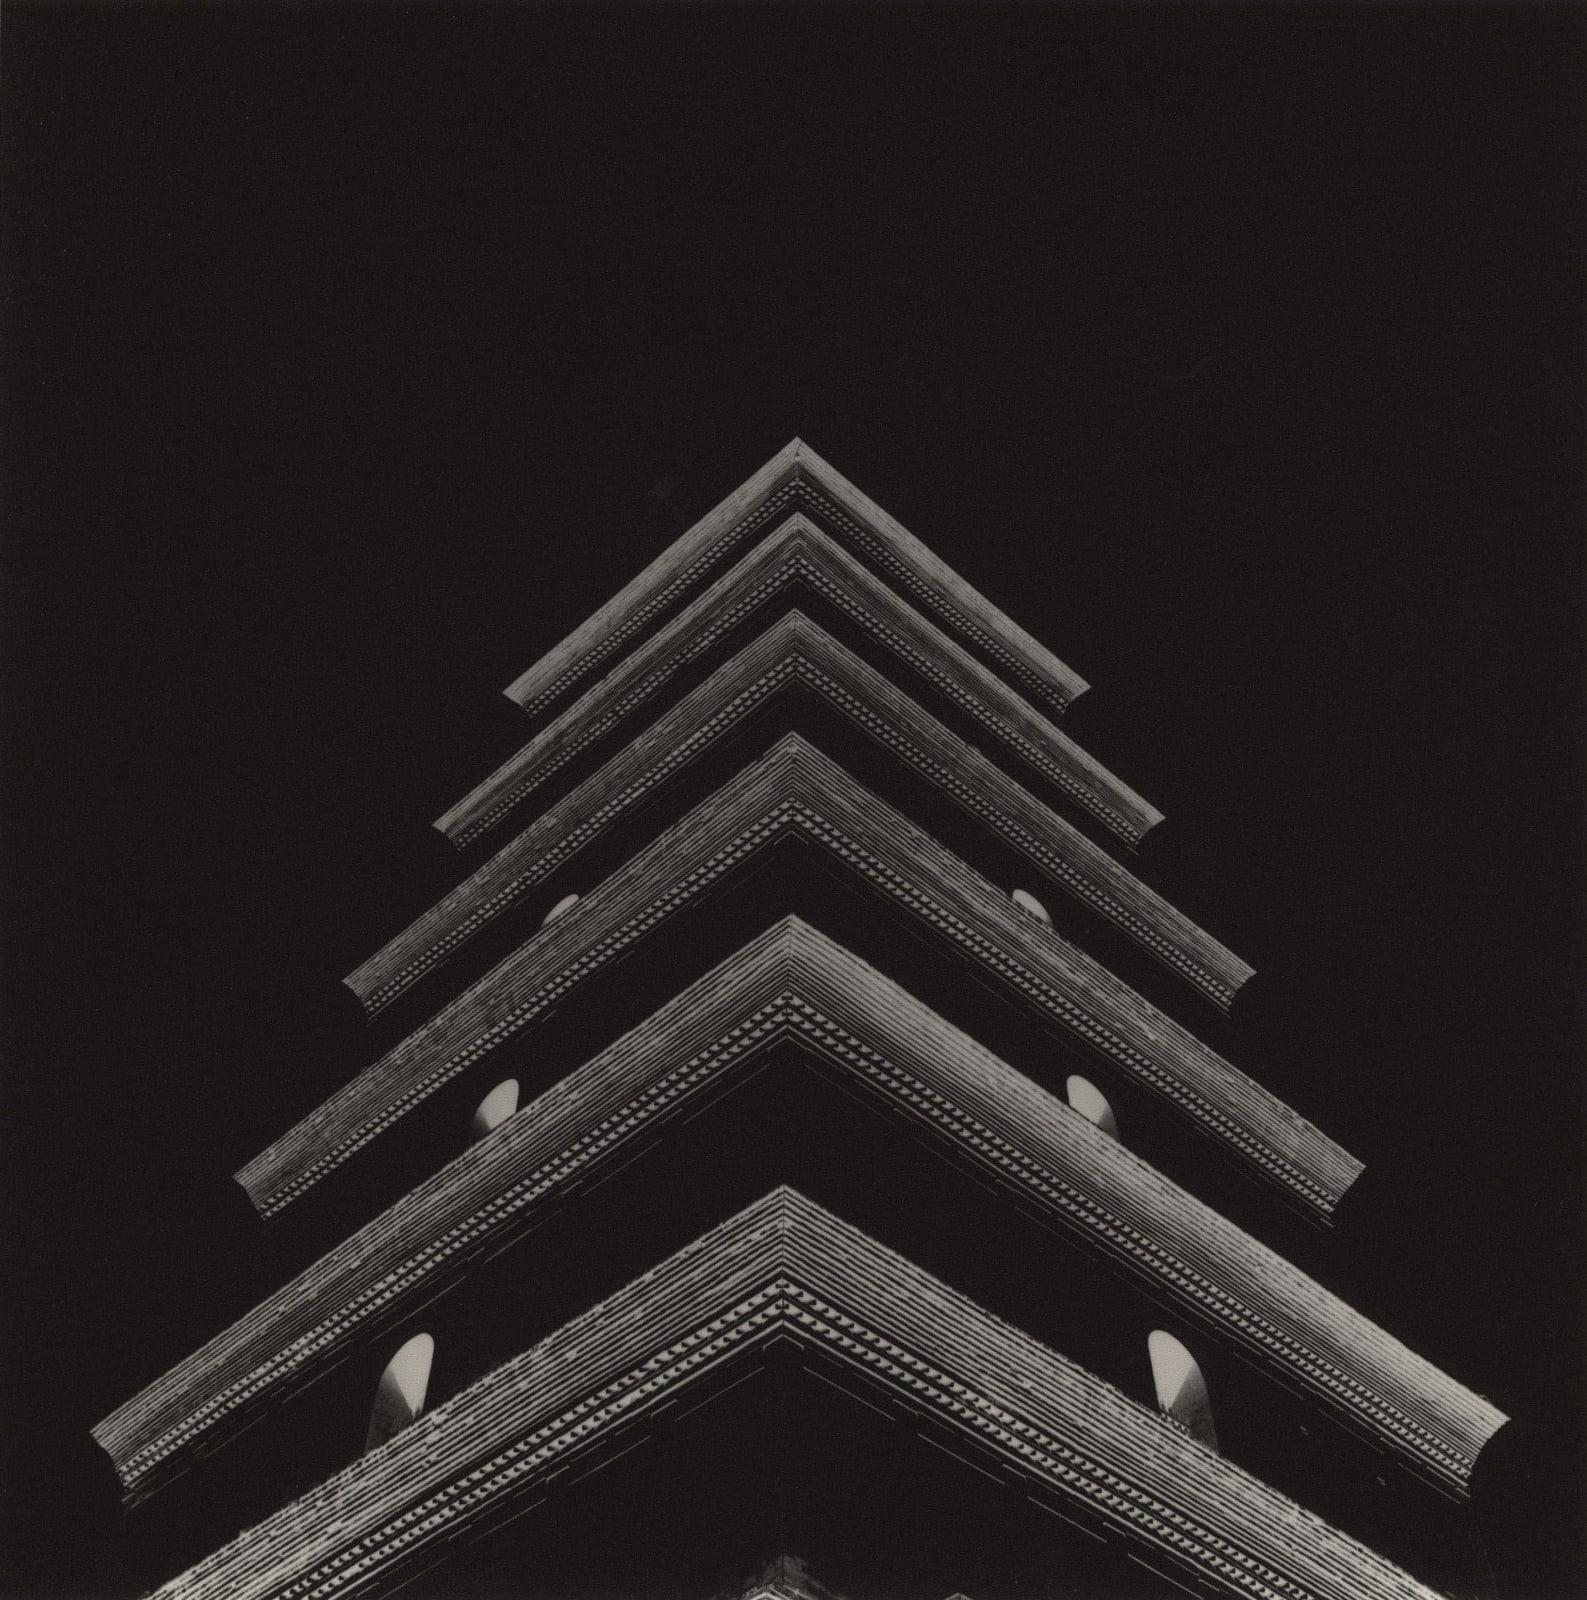 Lynn Davis, Great Wild Goose Pagoda (Tang Dynasty), Xi'an, China, 2001